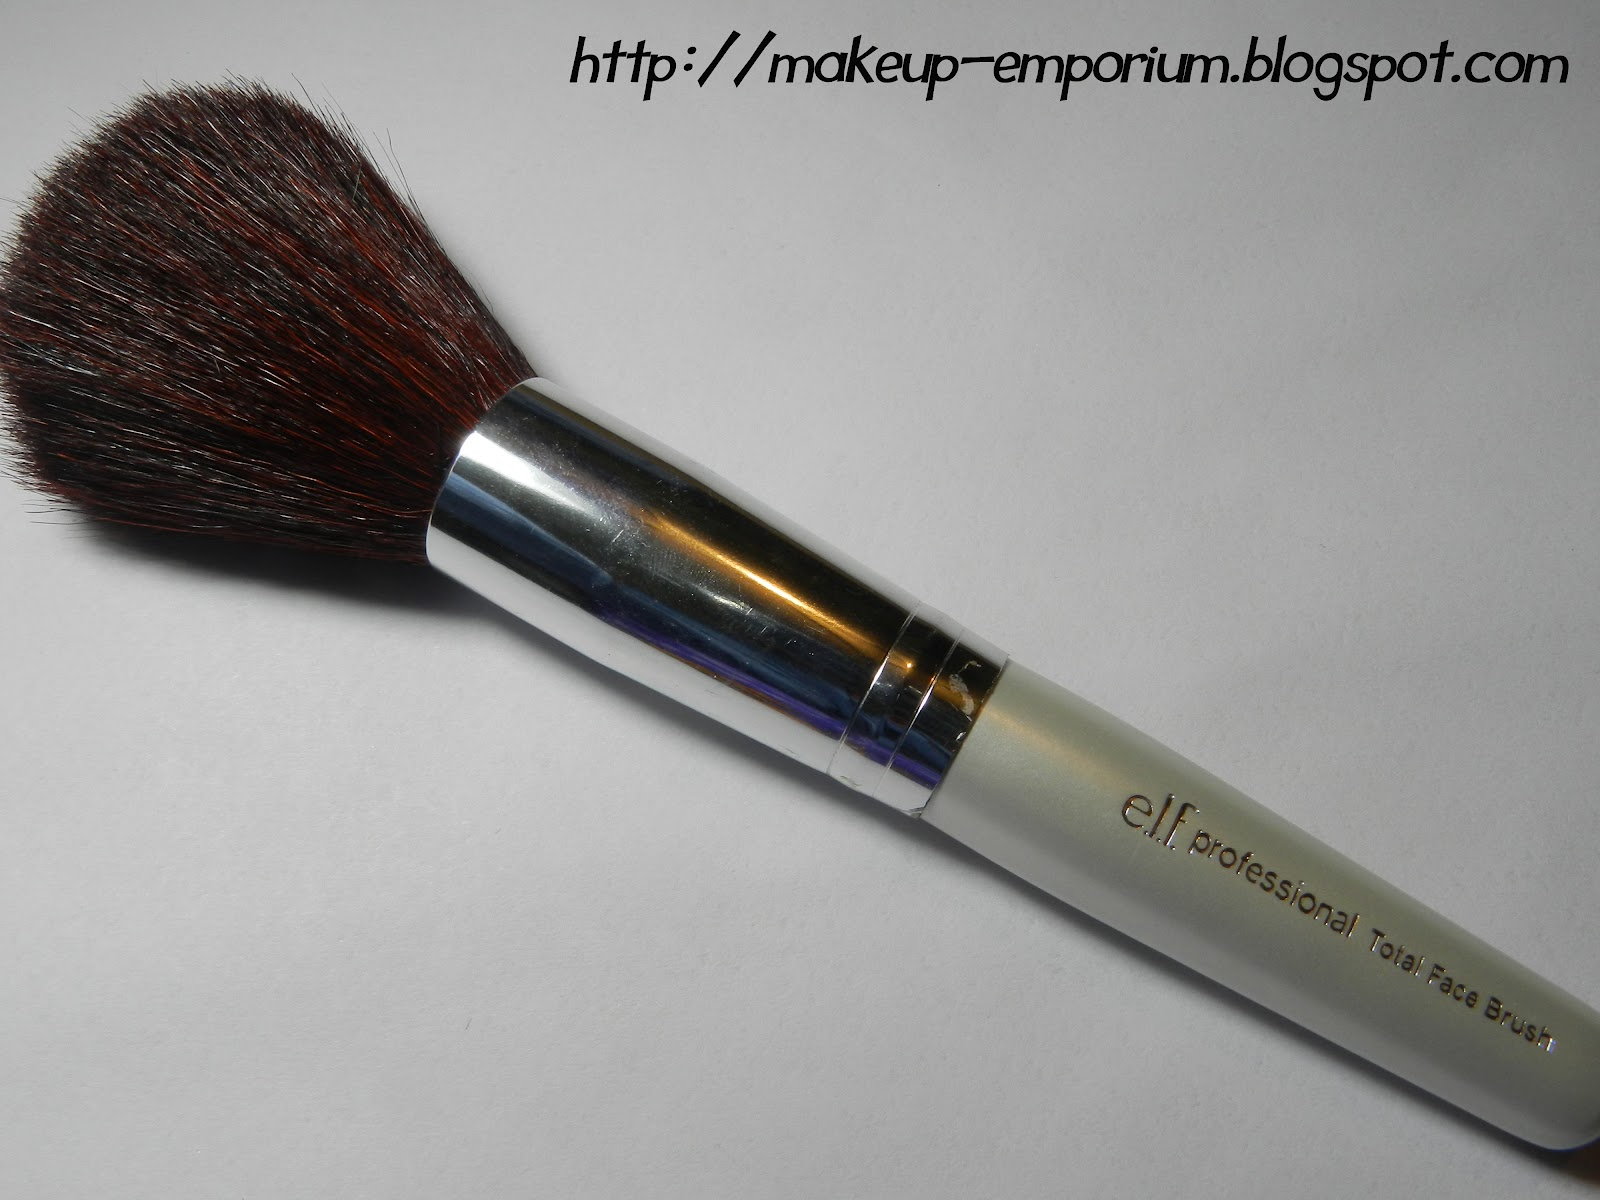 Makeup Emporium: Total Face Brush #1804 de E.L.F. : reseña y fotos.